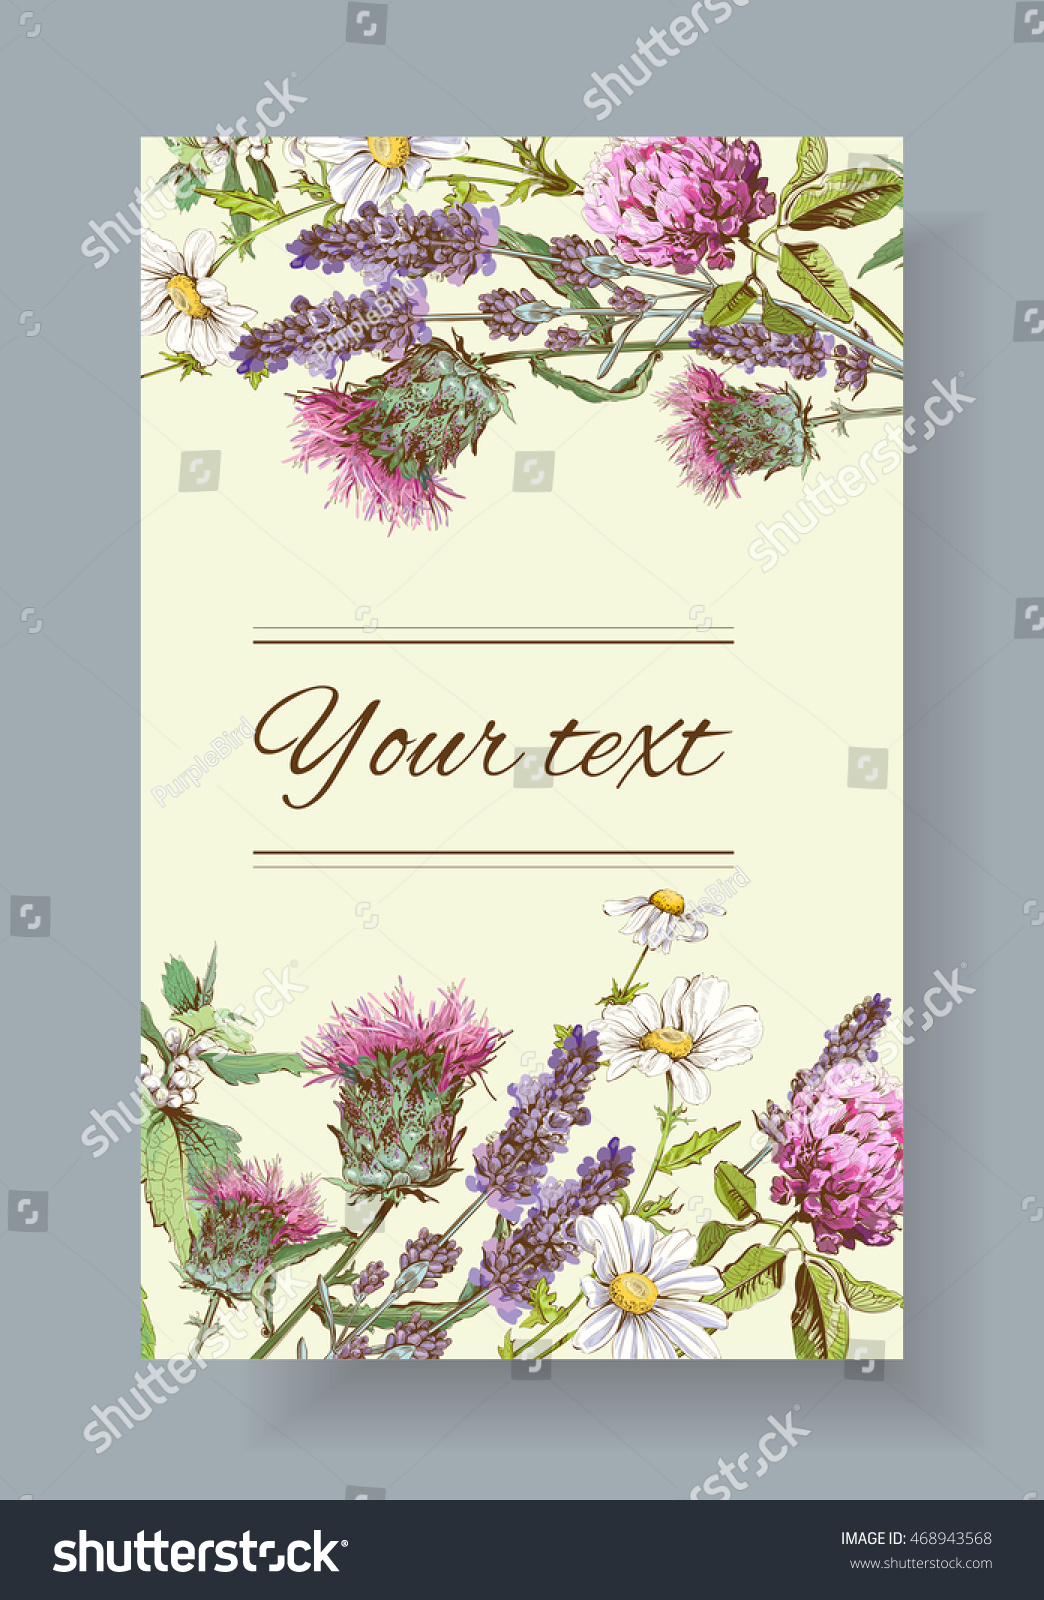 Vector Wild Flowers Herbs Banner Design Stock Vector Royalty Free 468943568